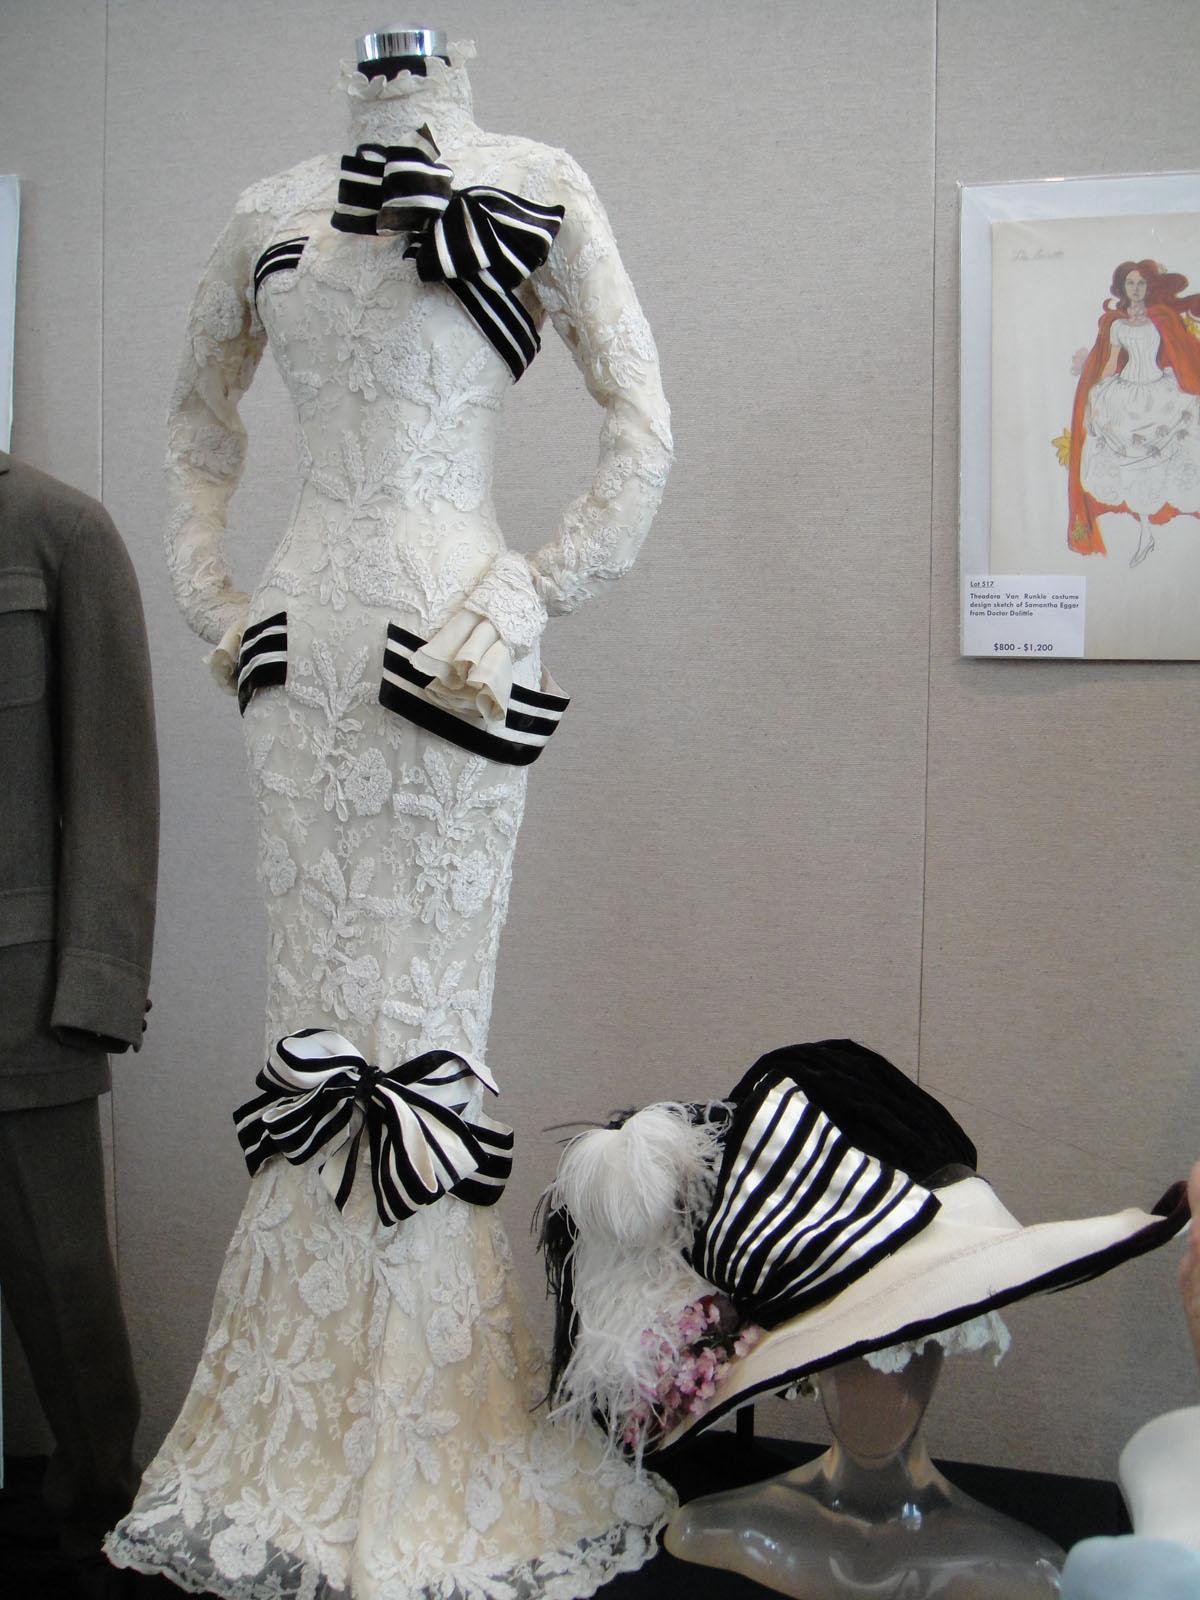 Images of audrey hepburn dresses in my fair